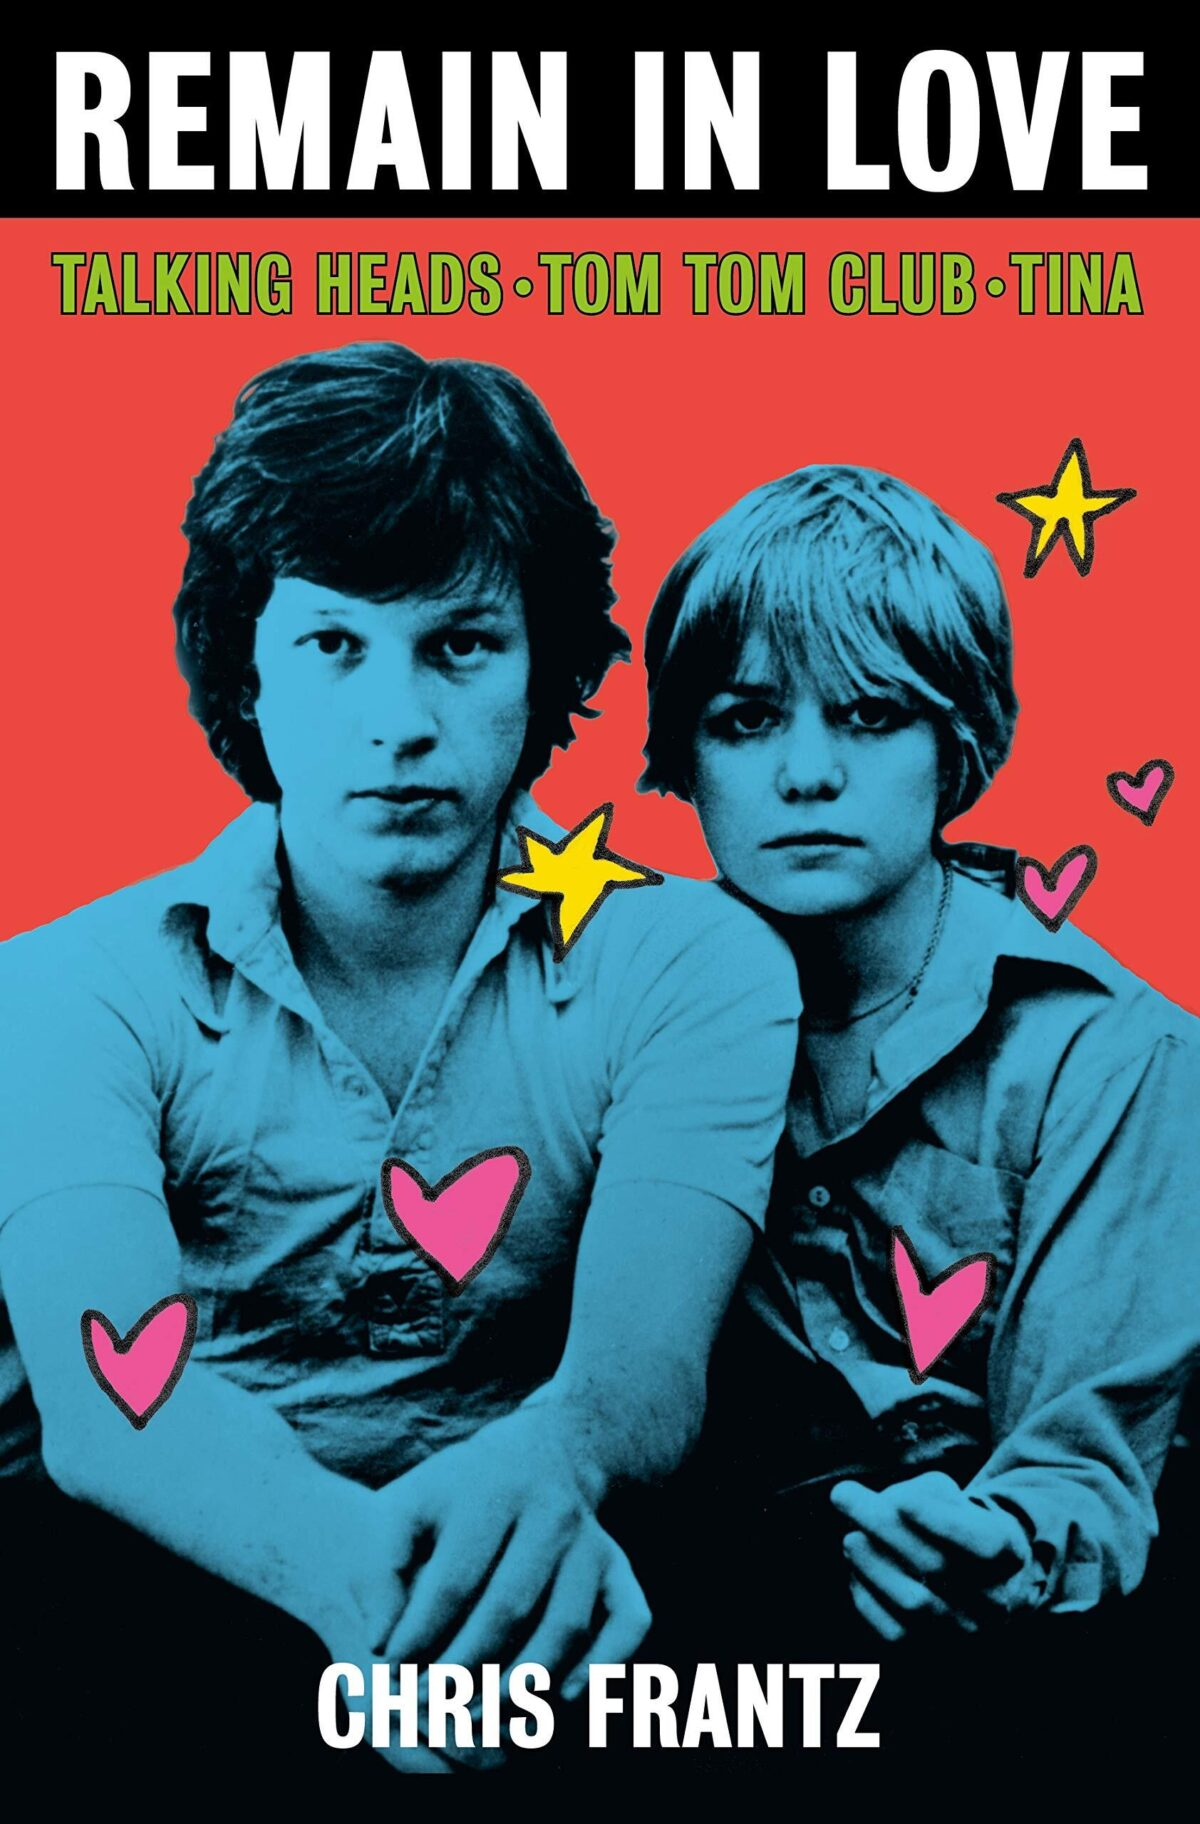 chris frantz presenta su libro remain in love talking heads tom tom club tina remaininlove book cover